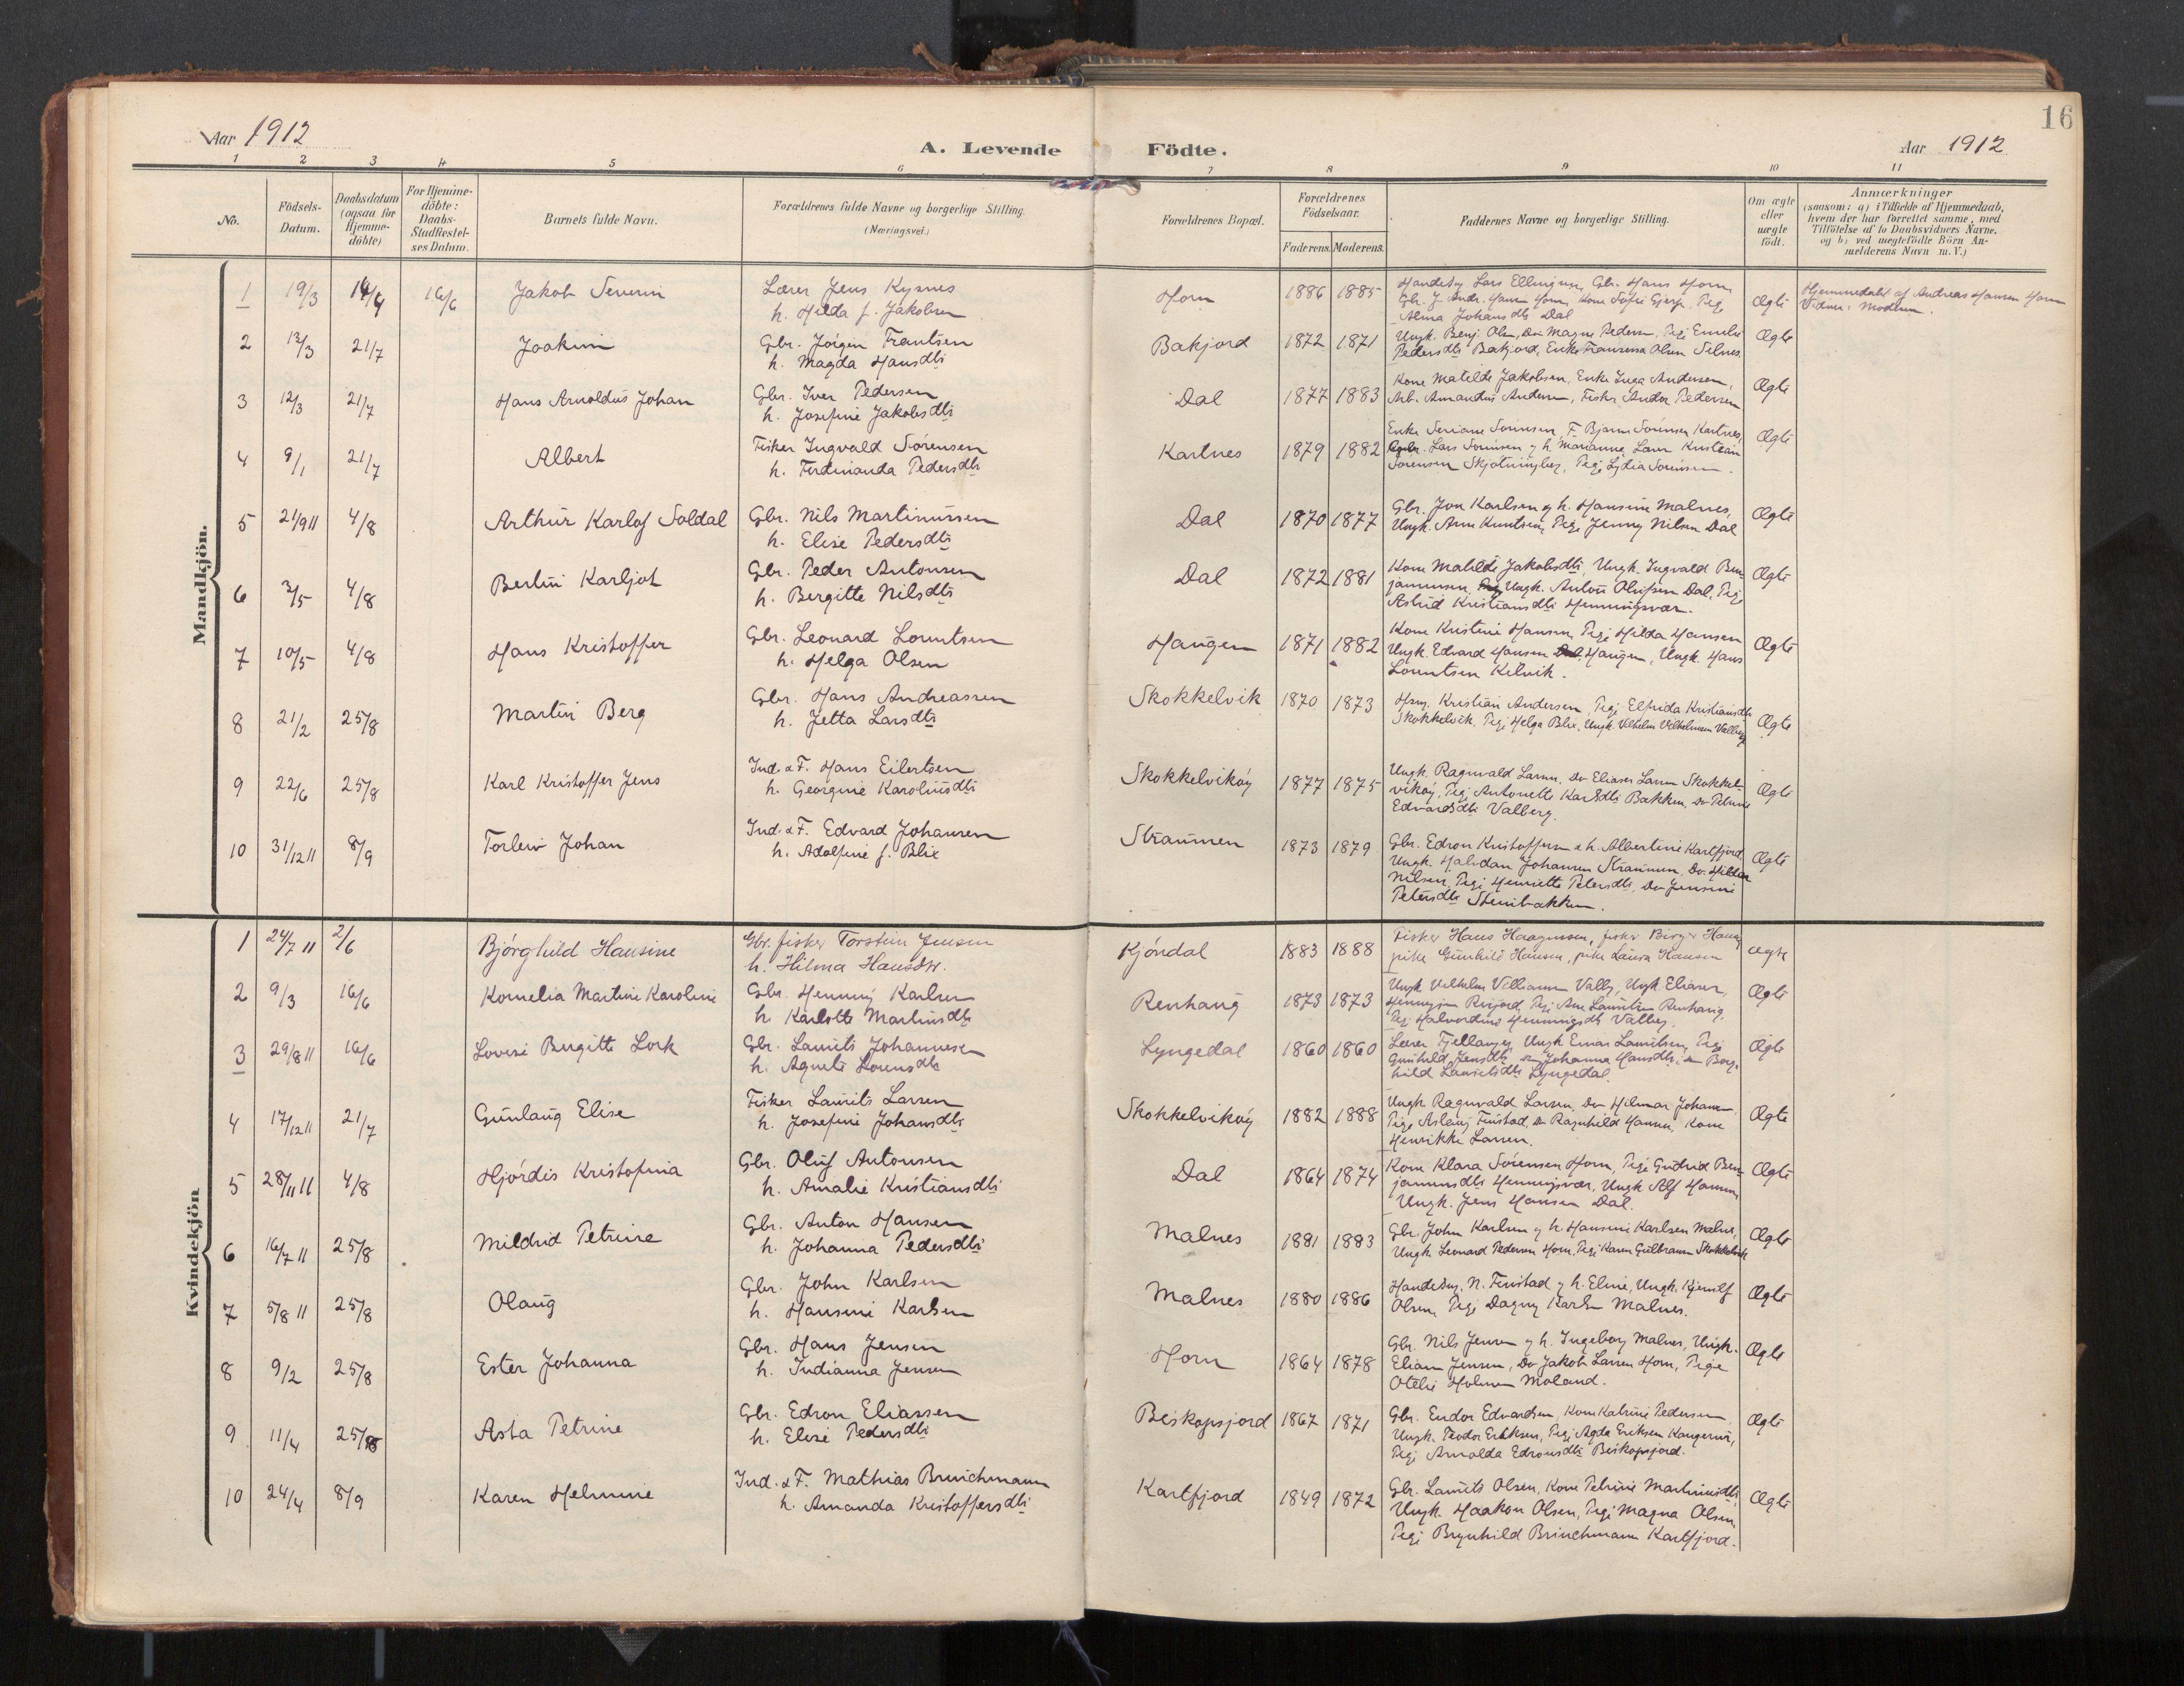 SAT, Ministerialprotokoller, klokkerbøker og fødselsregistre - Nordland, 884/L1194: Ministerialbok nr. 884A02, 1906-1937, s. 16